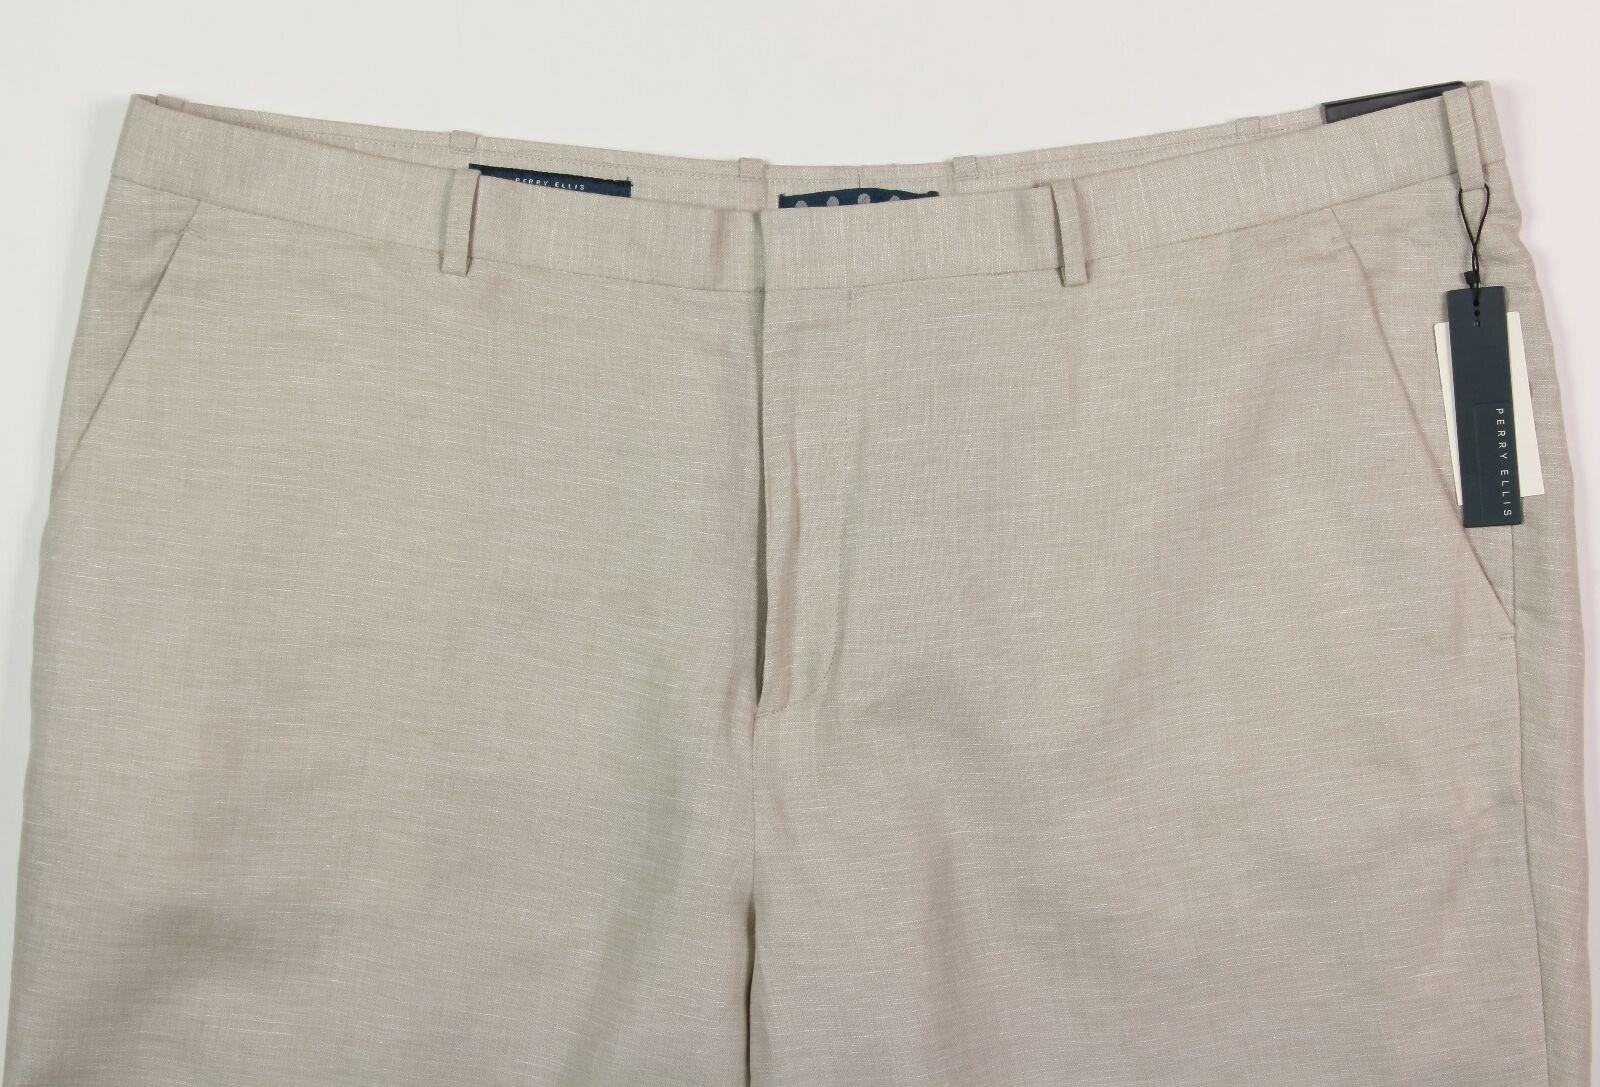 Men's PERRY ELLIS Khaki Casual Dress Linen Cotton Pants 48x32 48 NWT NEW Wow